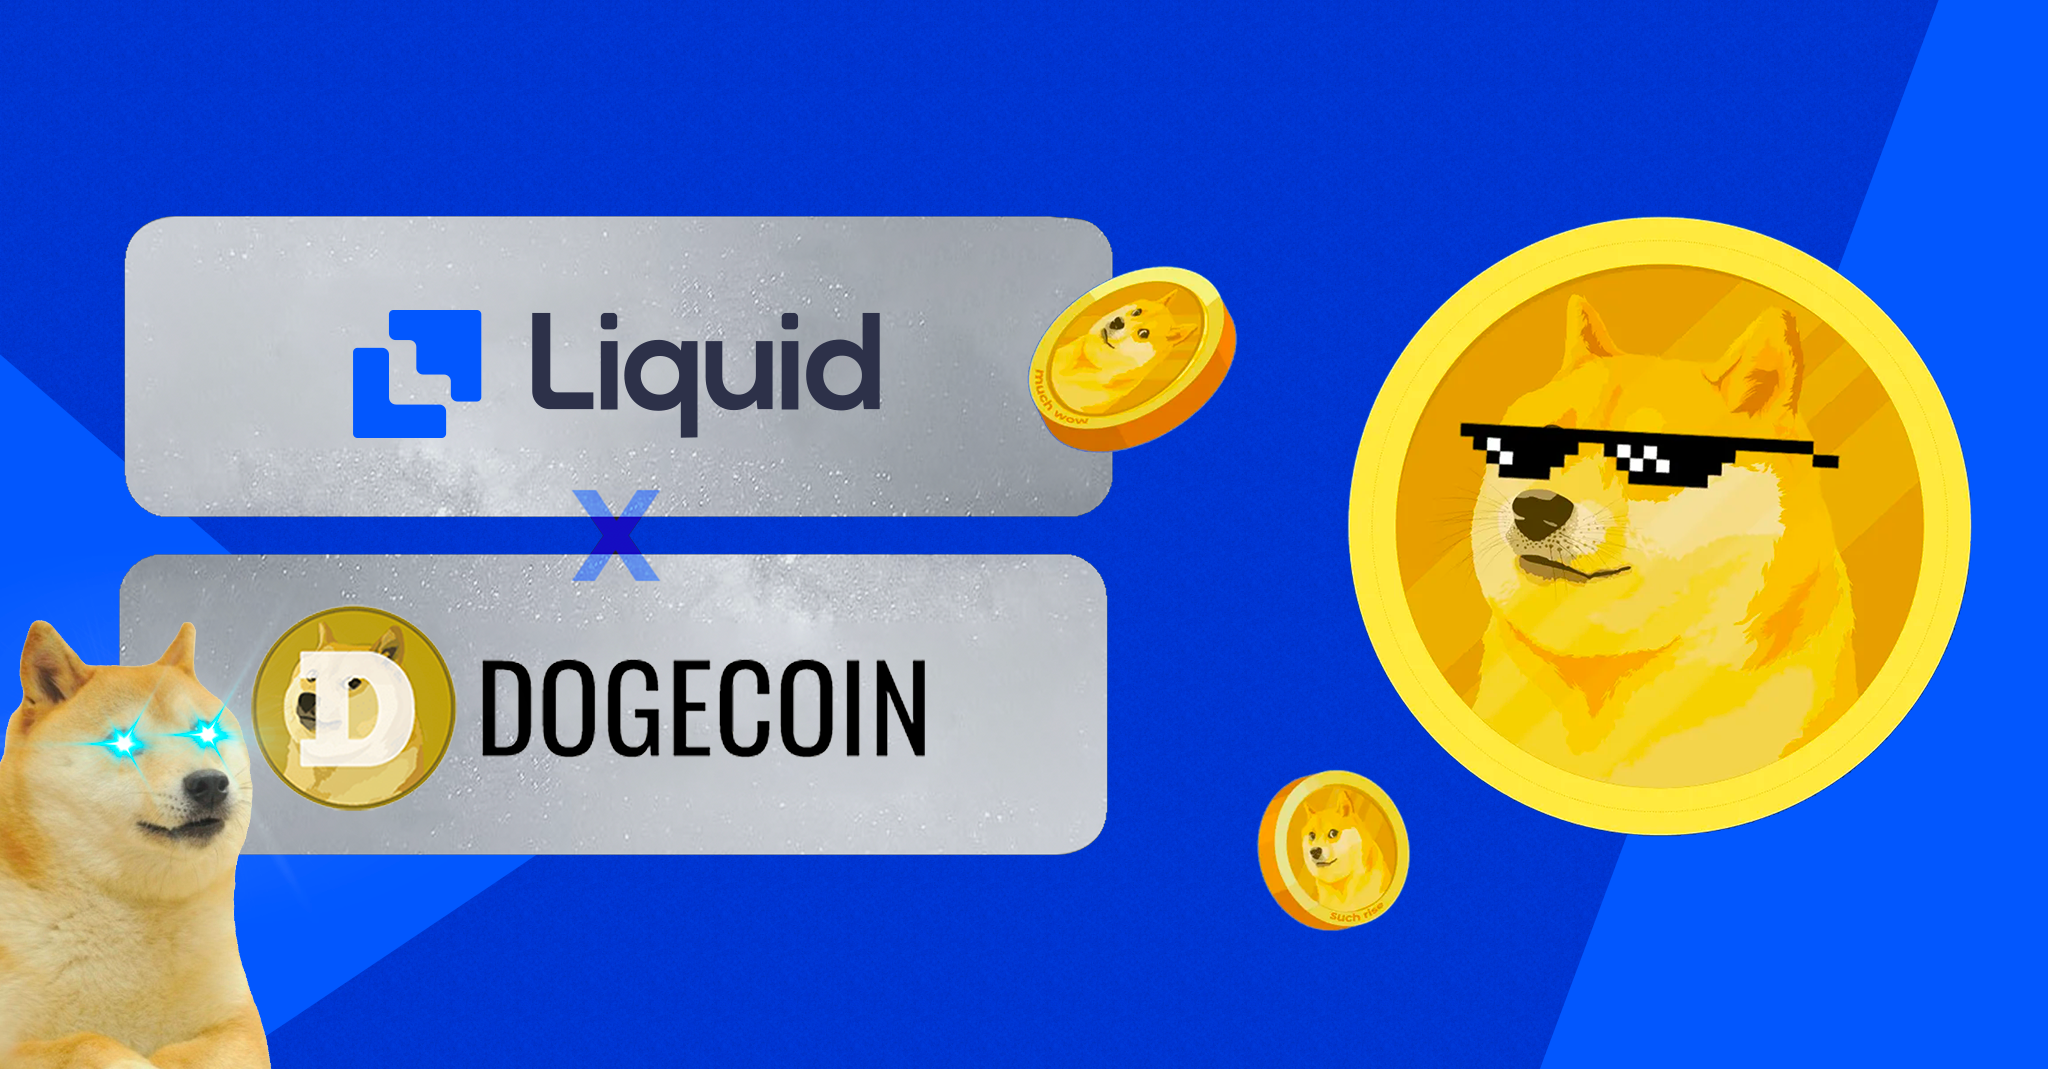 buy dogecoin on Liquid